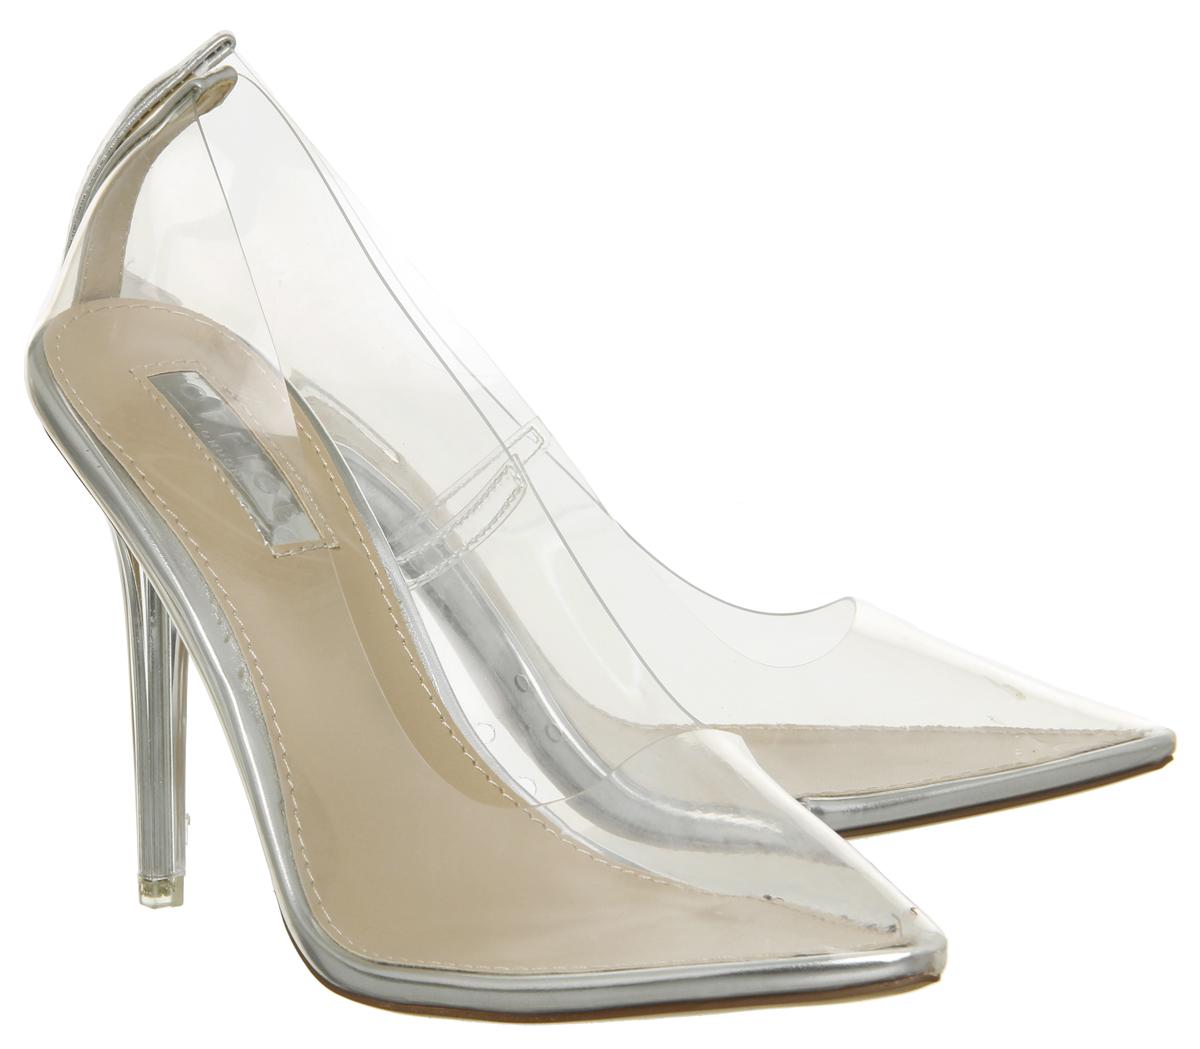 82fe9f70922 Womens Office Hadie Transparent Heel Court Shoes Perspex Heels